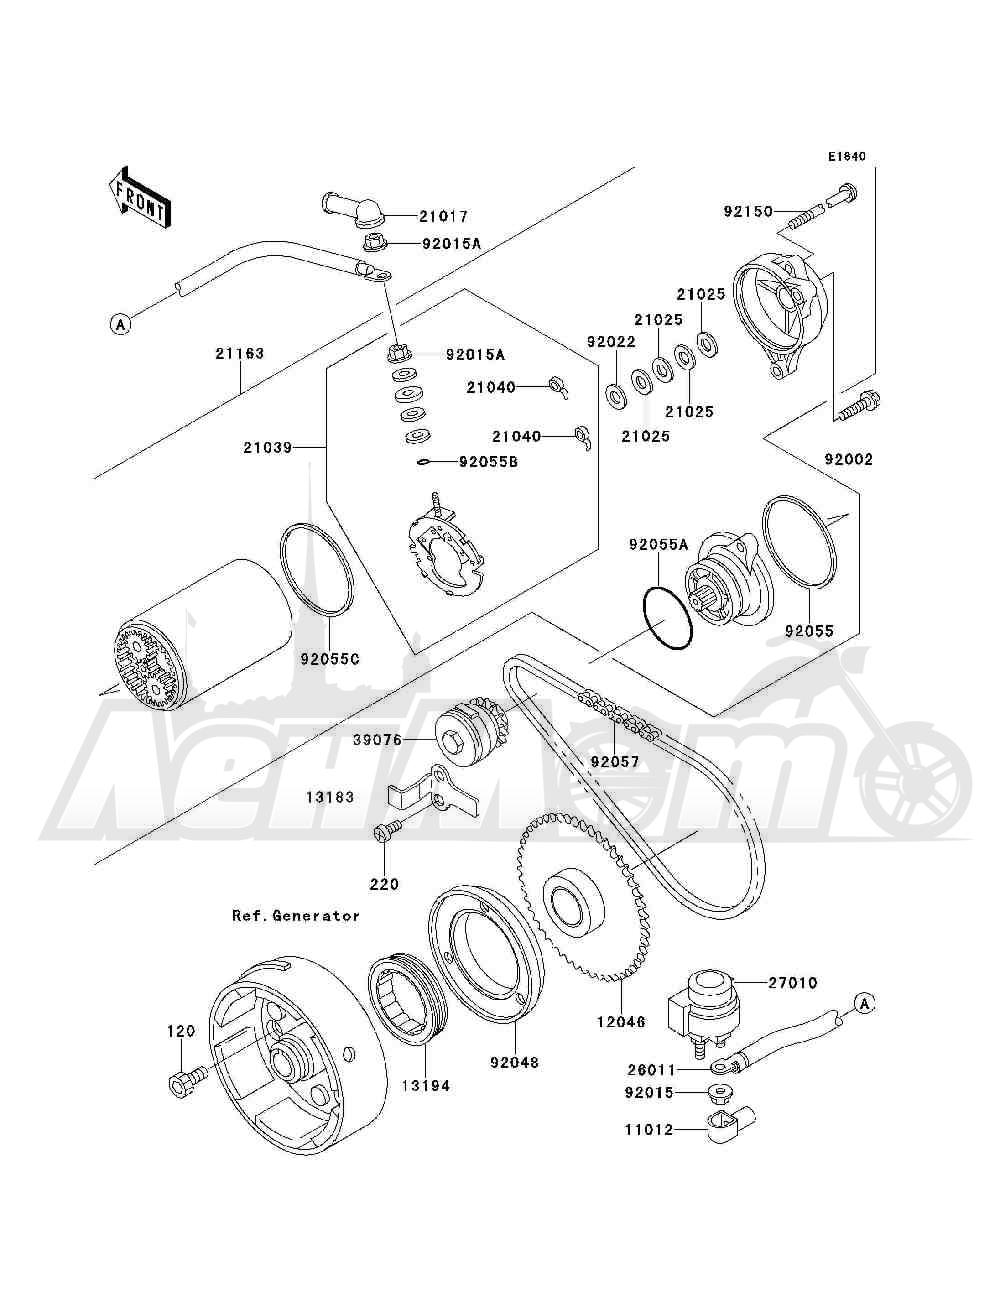 Запчасти для Квадроцикла Kawasaki 1994 BAYOU 300 4X4 (KLF300-C6) Раздел: STARTER MOTOR | электростартер